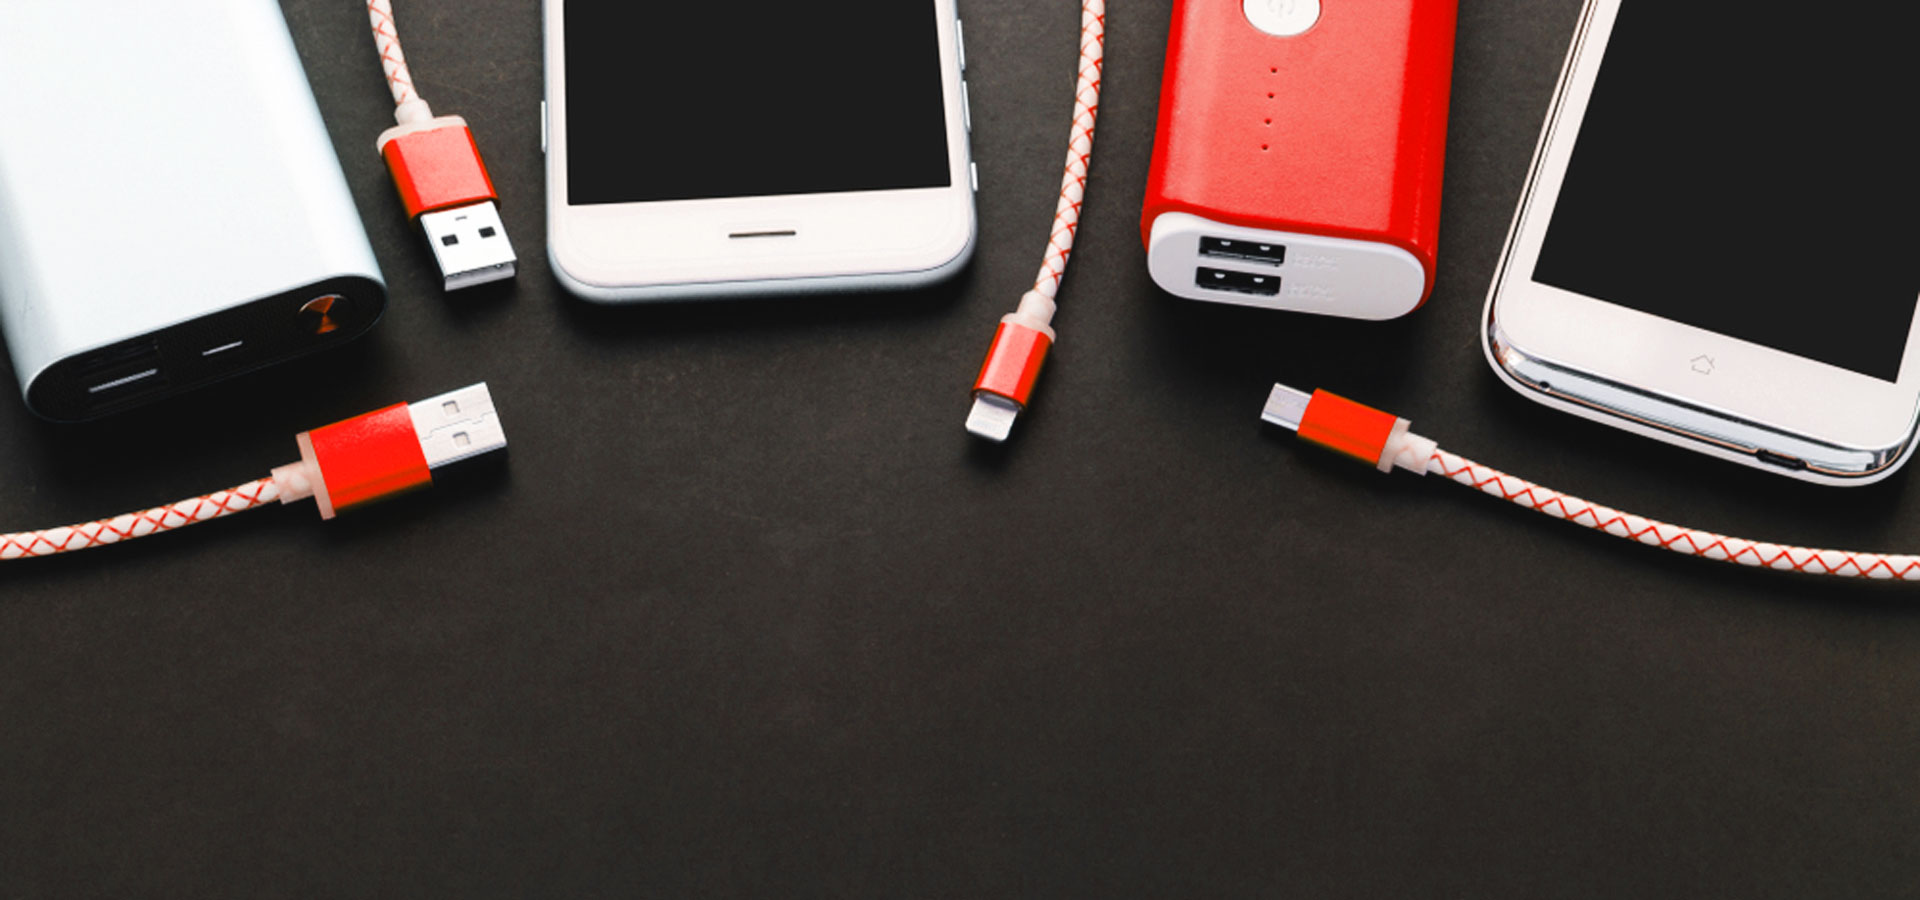 SMARTPHONE ACCESSORIES</br>